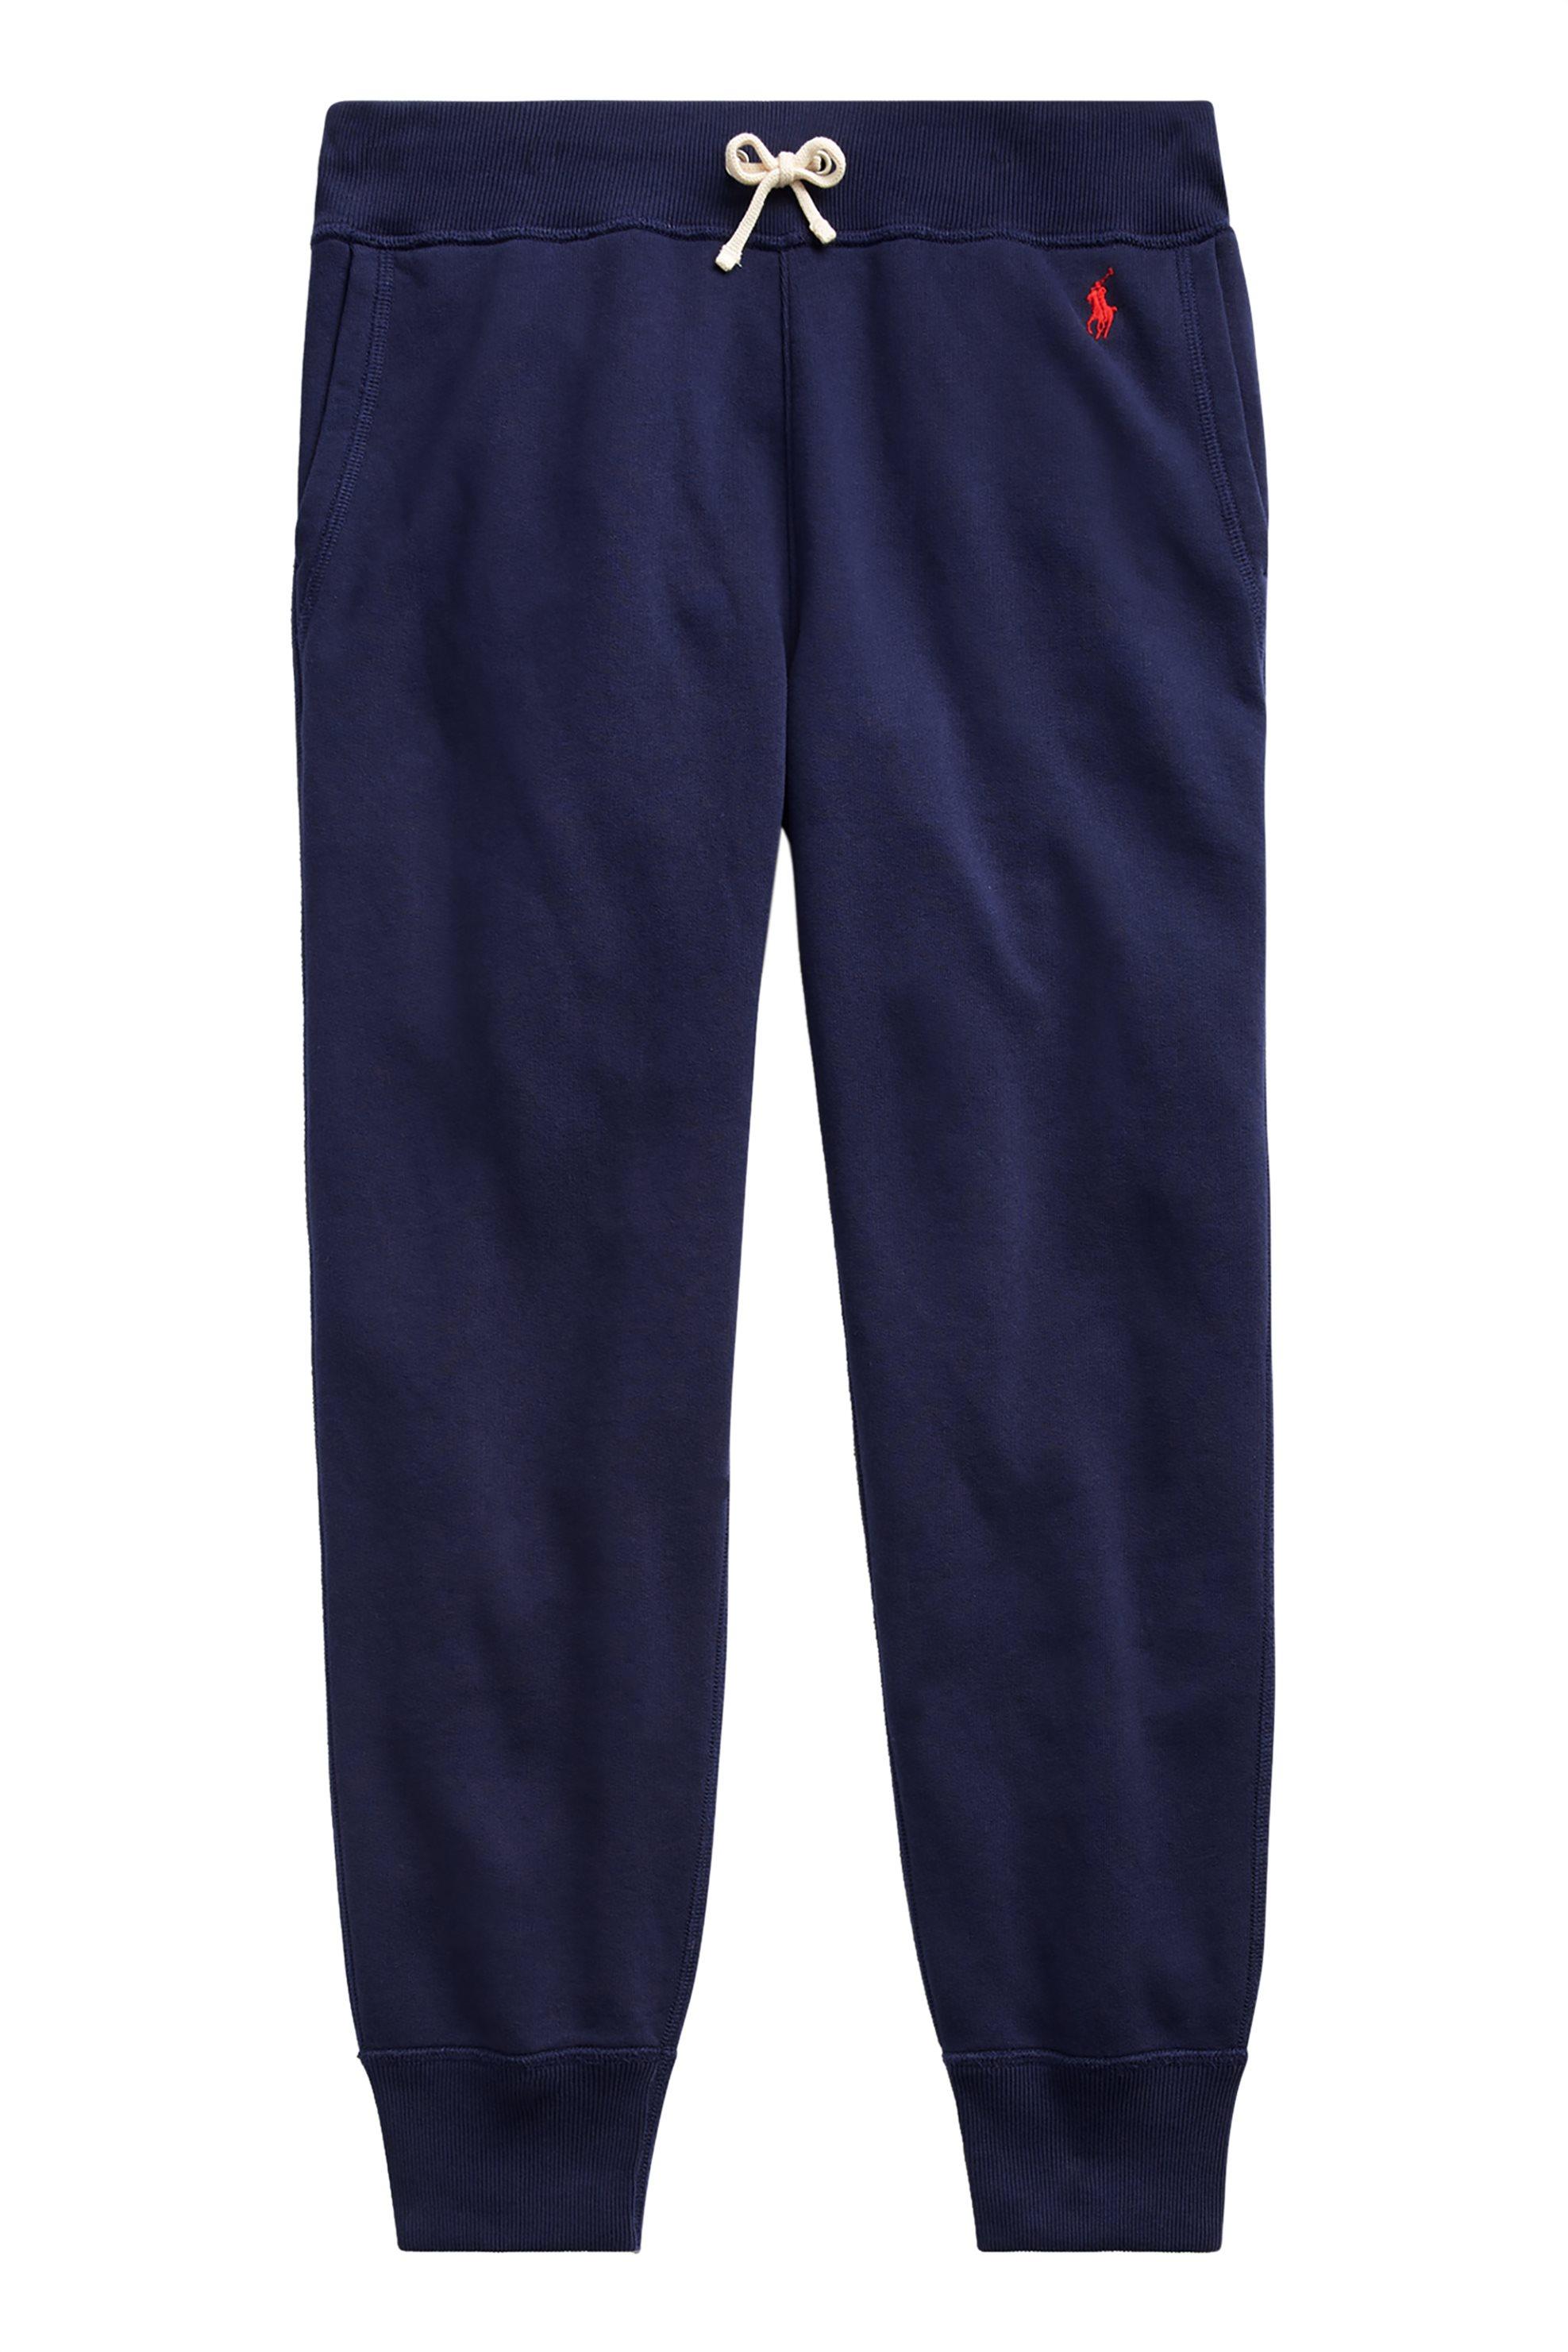 Polo Ralph Lauren γυναικεία βαμβακερή φόρμα - 211704858010 - Μπλε γυναικα   ρουχα   αθλητικα   αθλητικά ρούχα   παντελόνια   παντελόνια φόρμας   ί